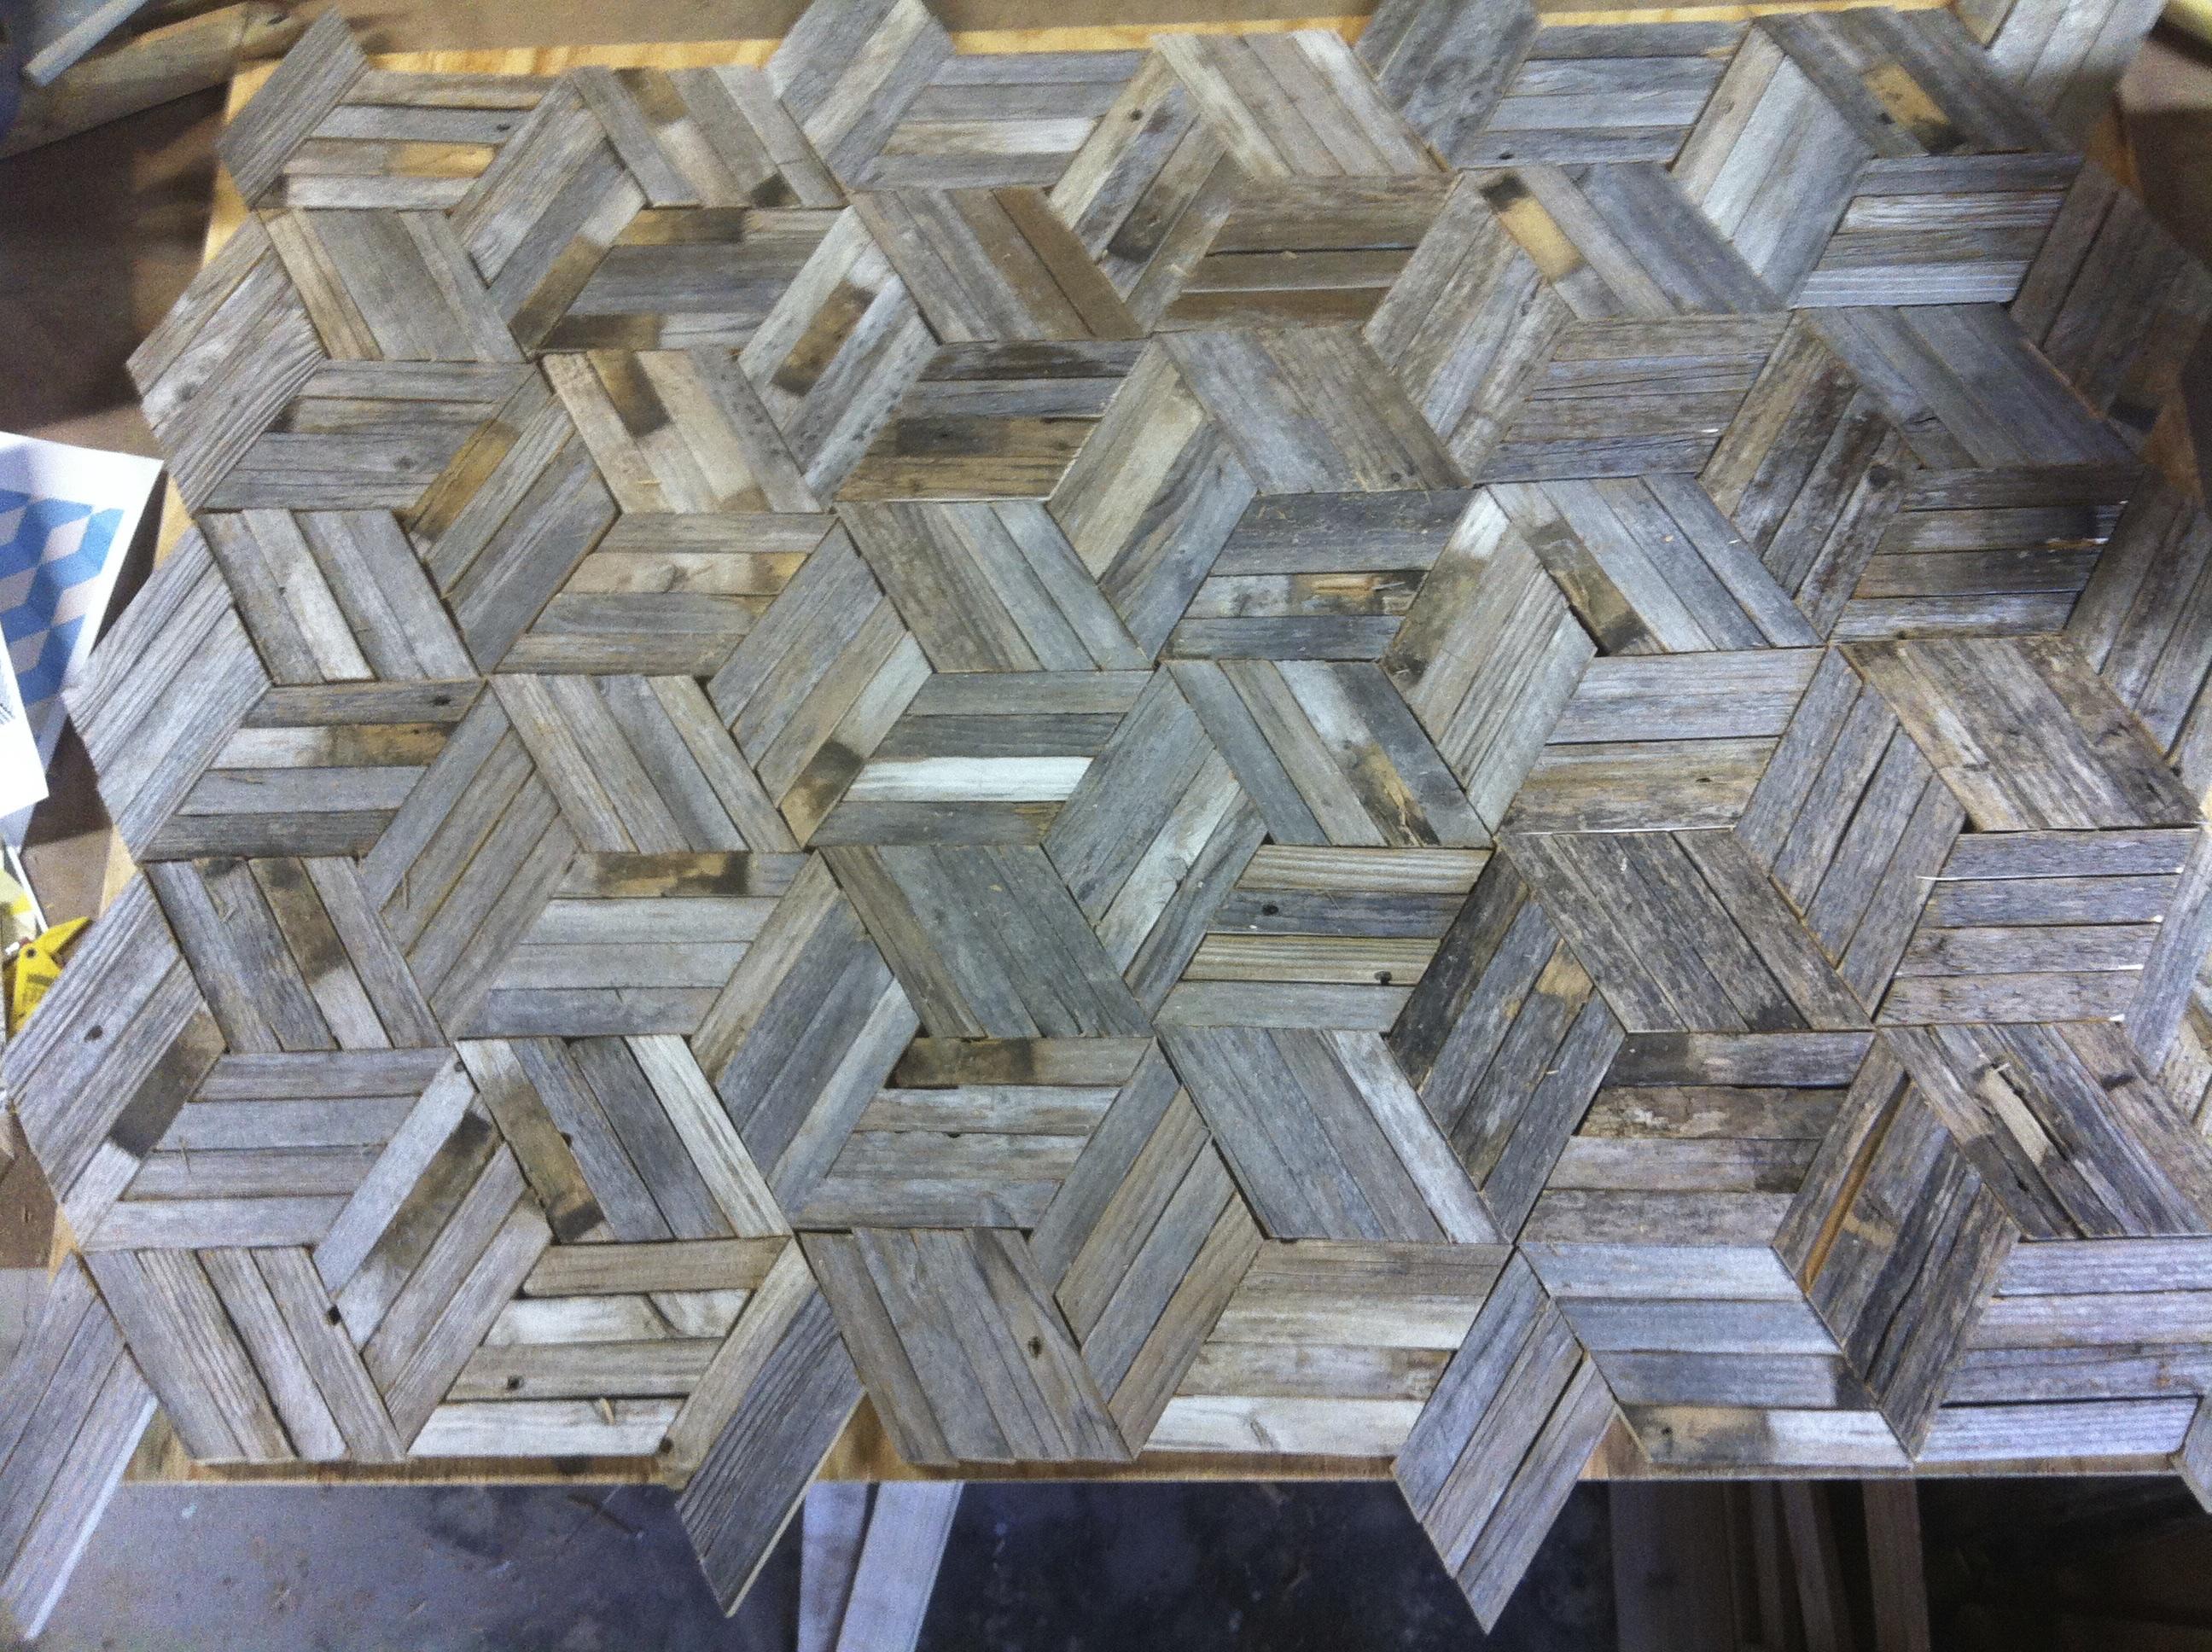 Intricate geometric wall